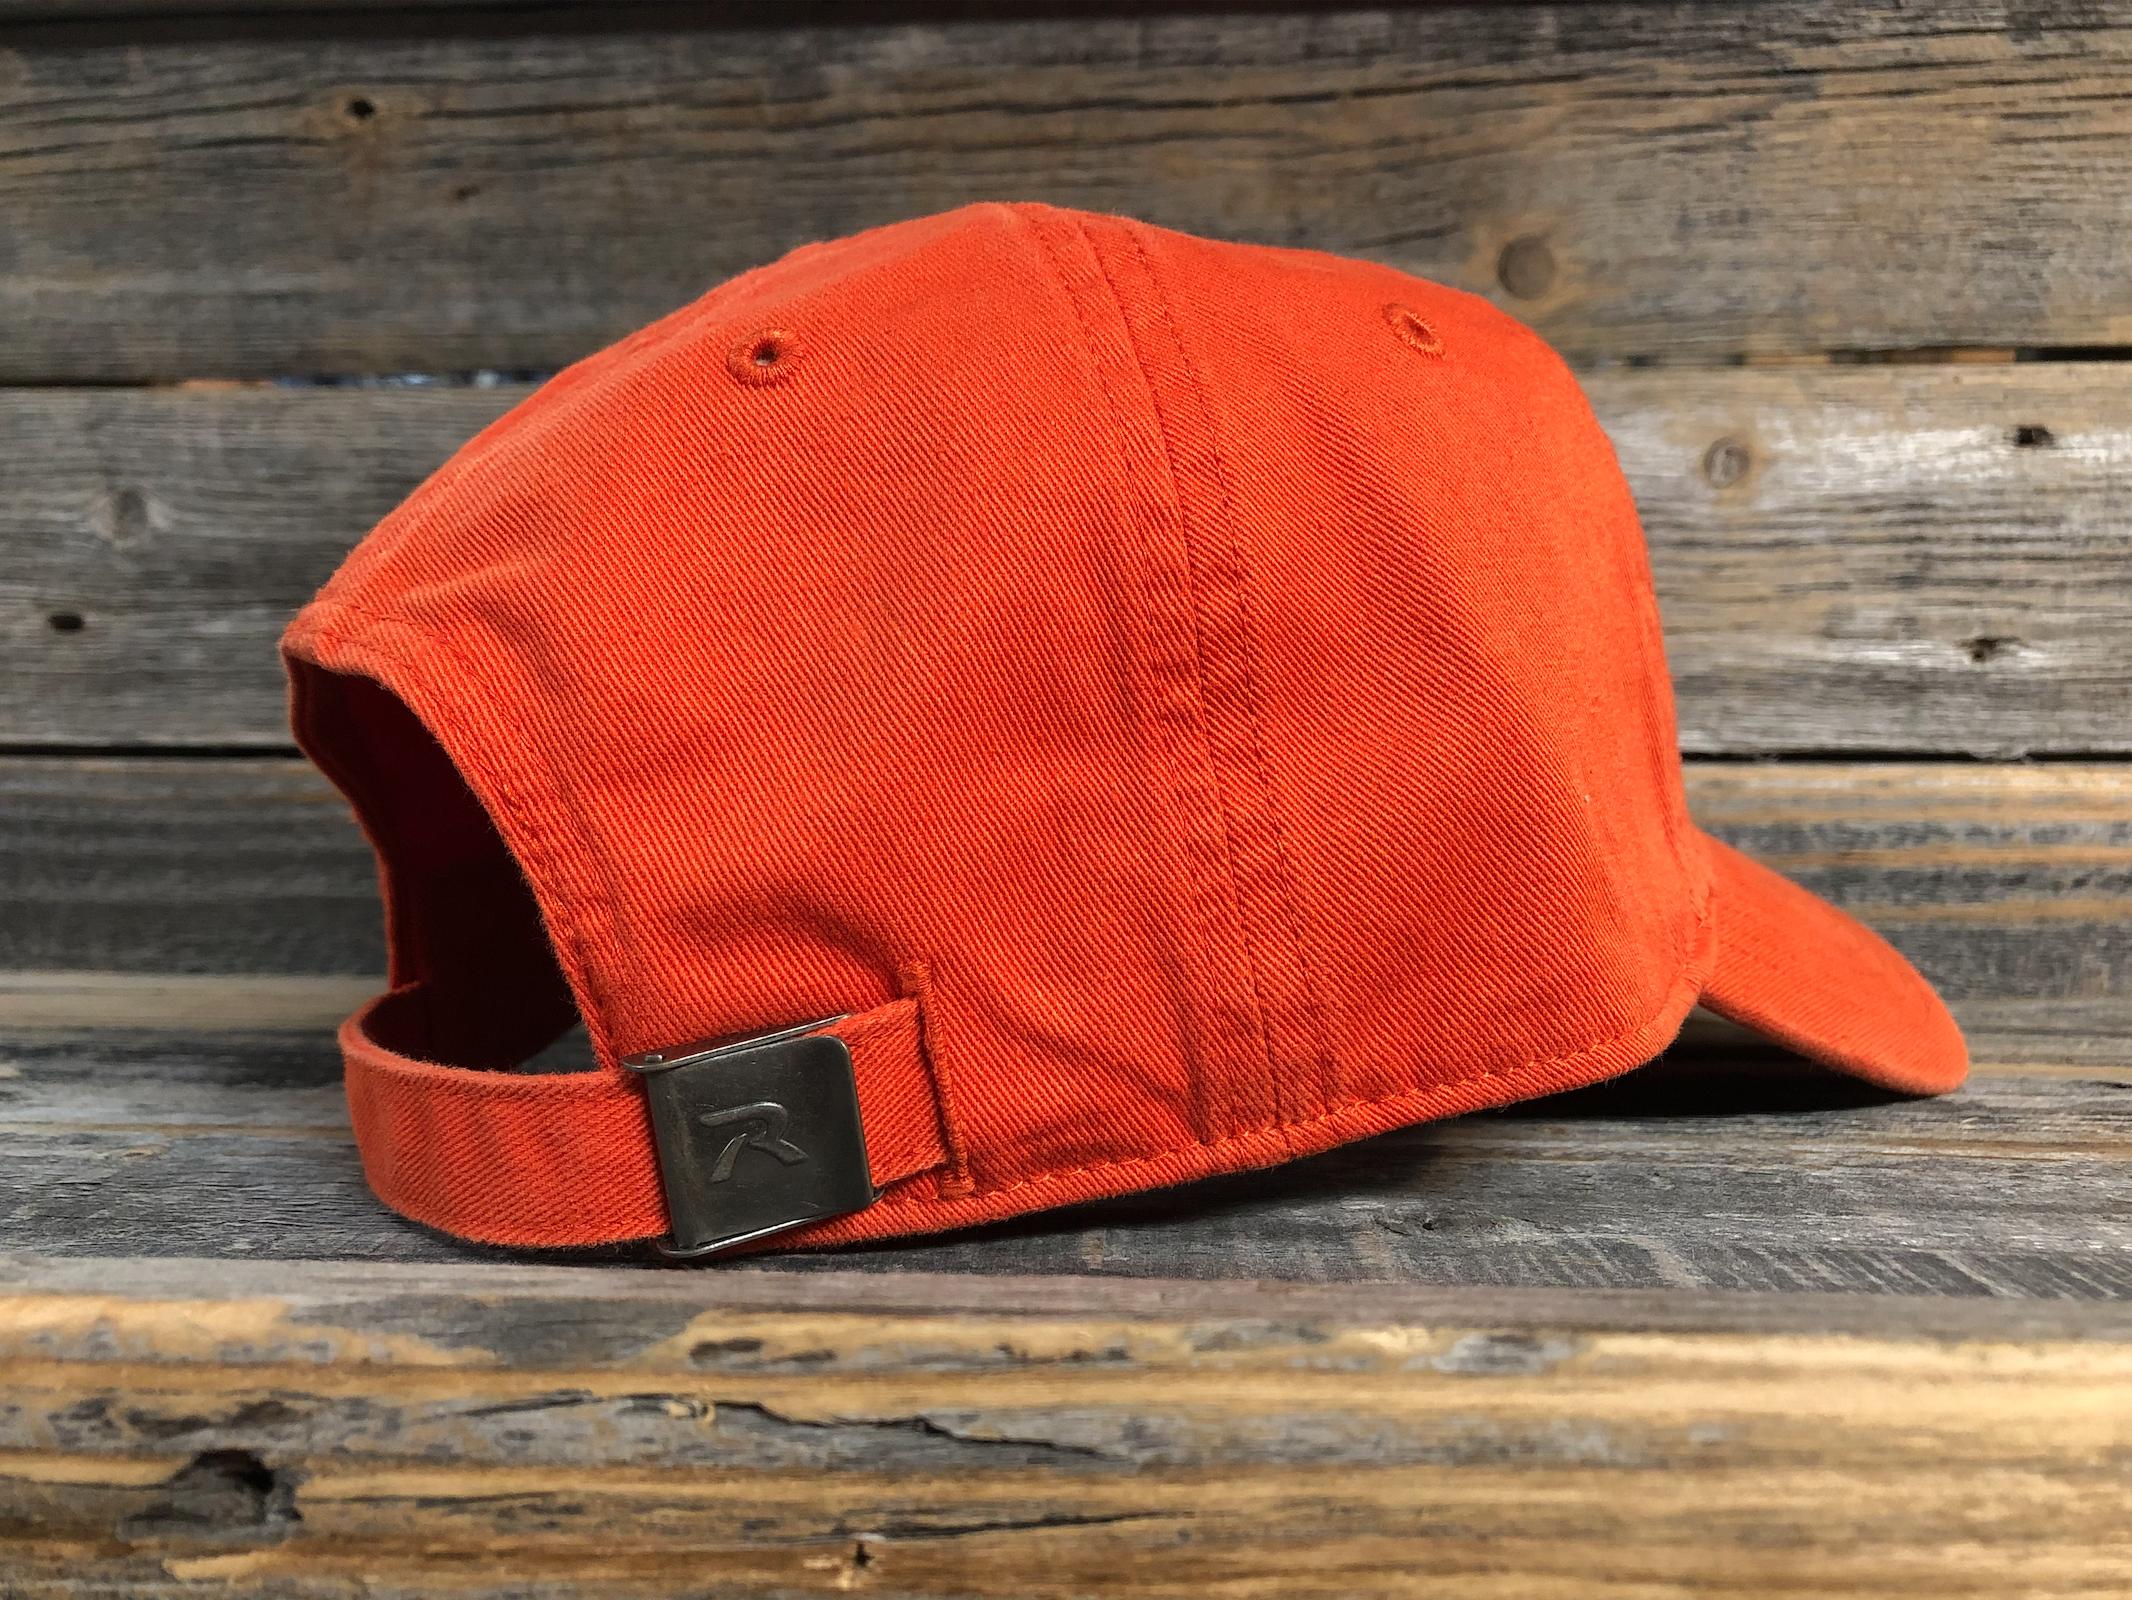 Dawg Bone Dad Hats Orange Keepin It Fresh Get updates on uga football, basketball, baseball, gymnastics and other sports. keepin it fresh